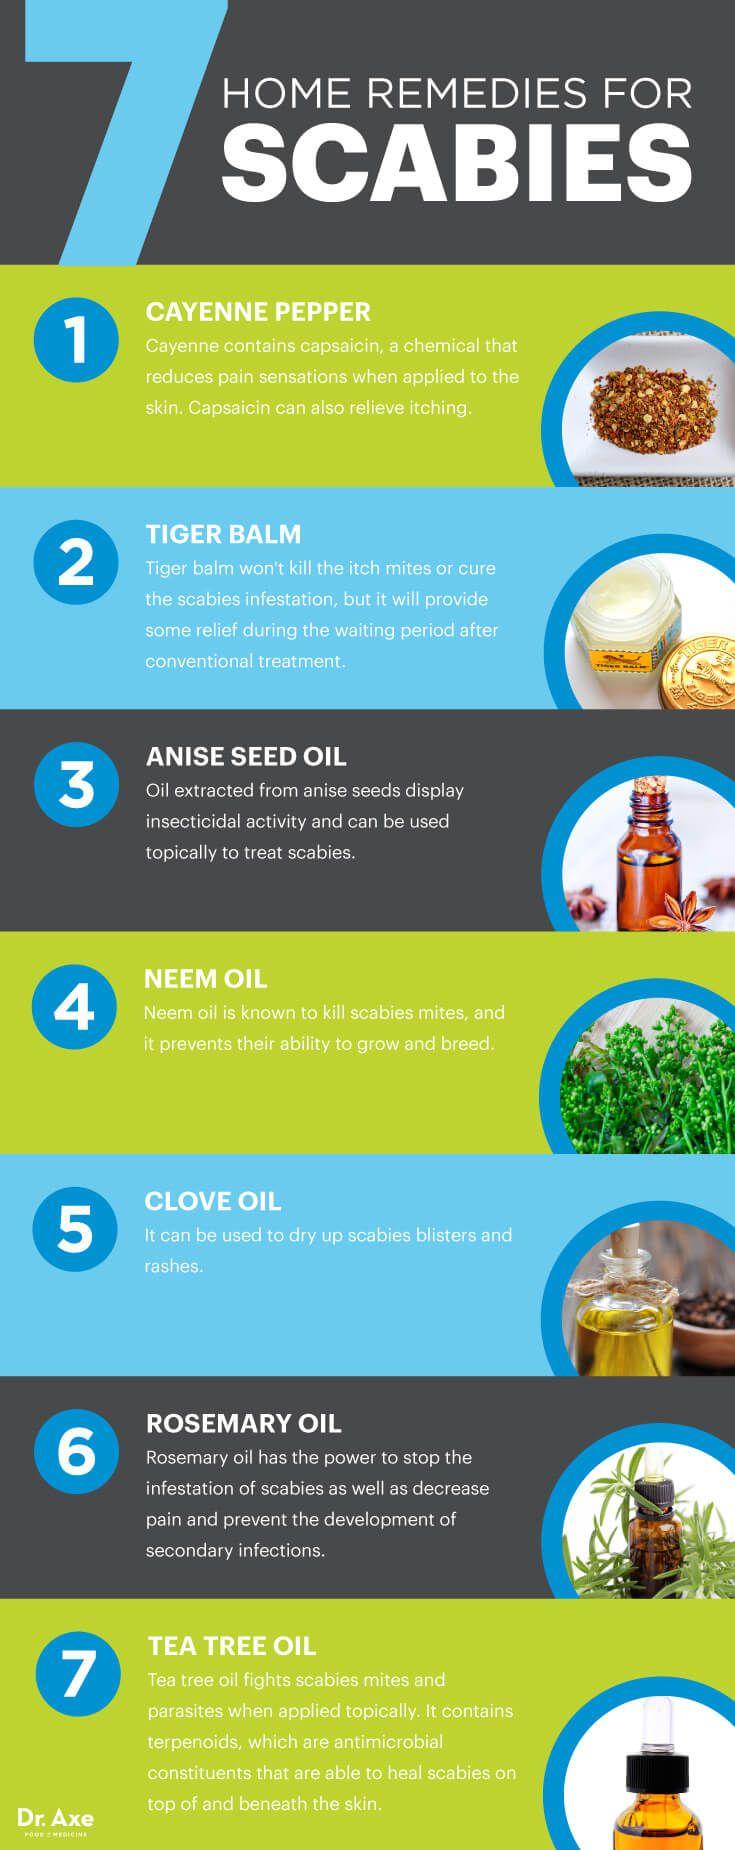 4d546bb4393e2d58b3d19fa58e23c583 - How To Get Rid Of Mites On Skin Naturally